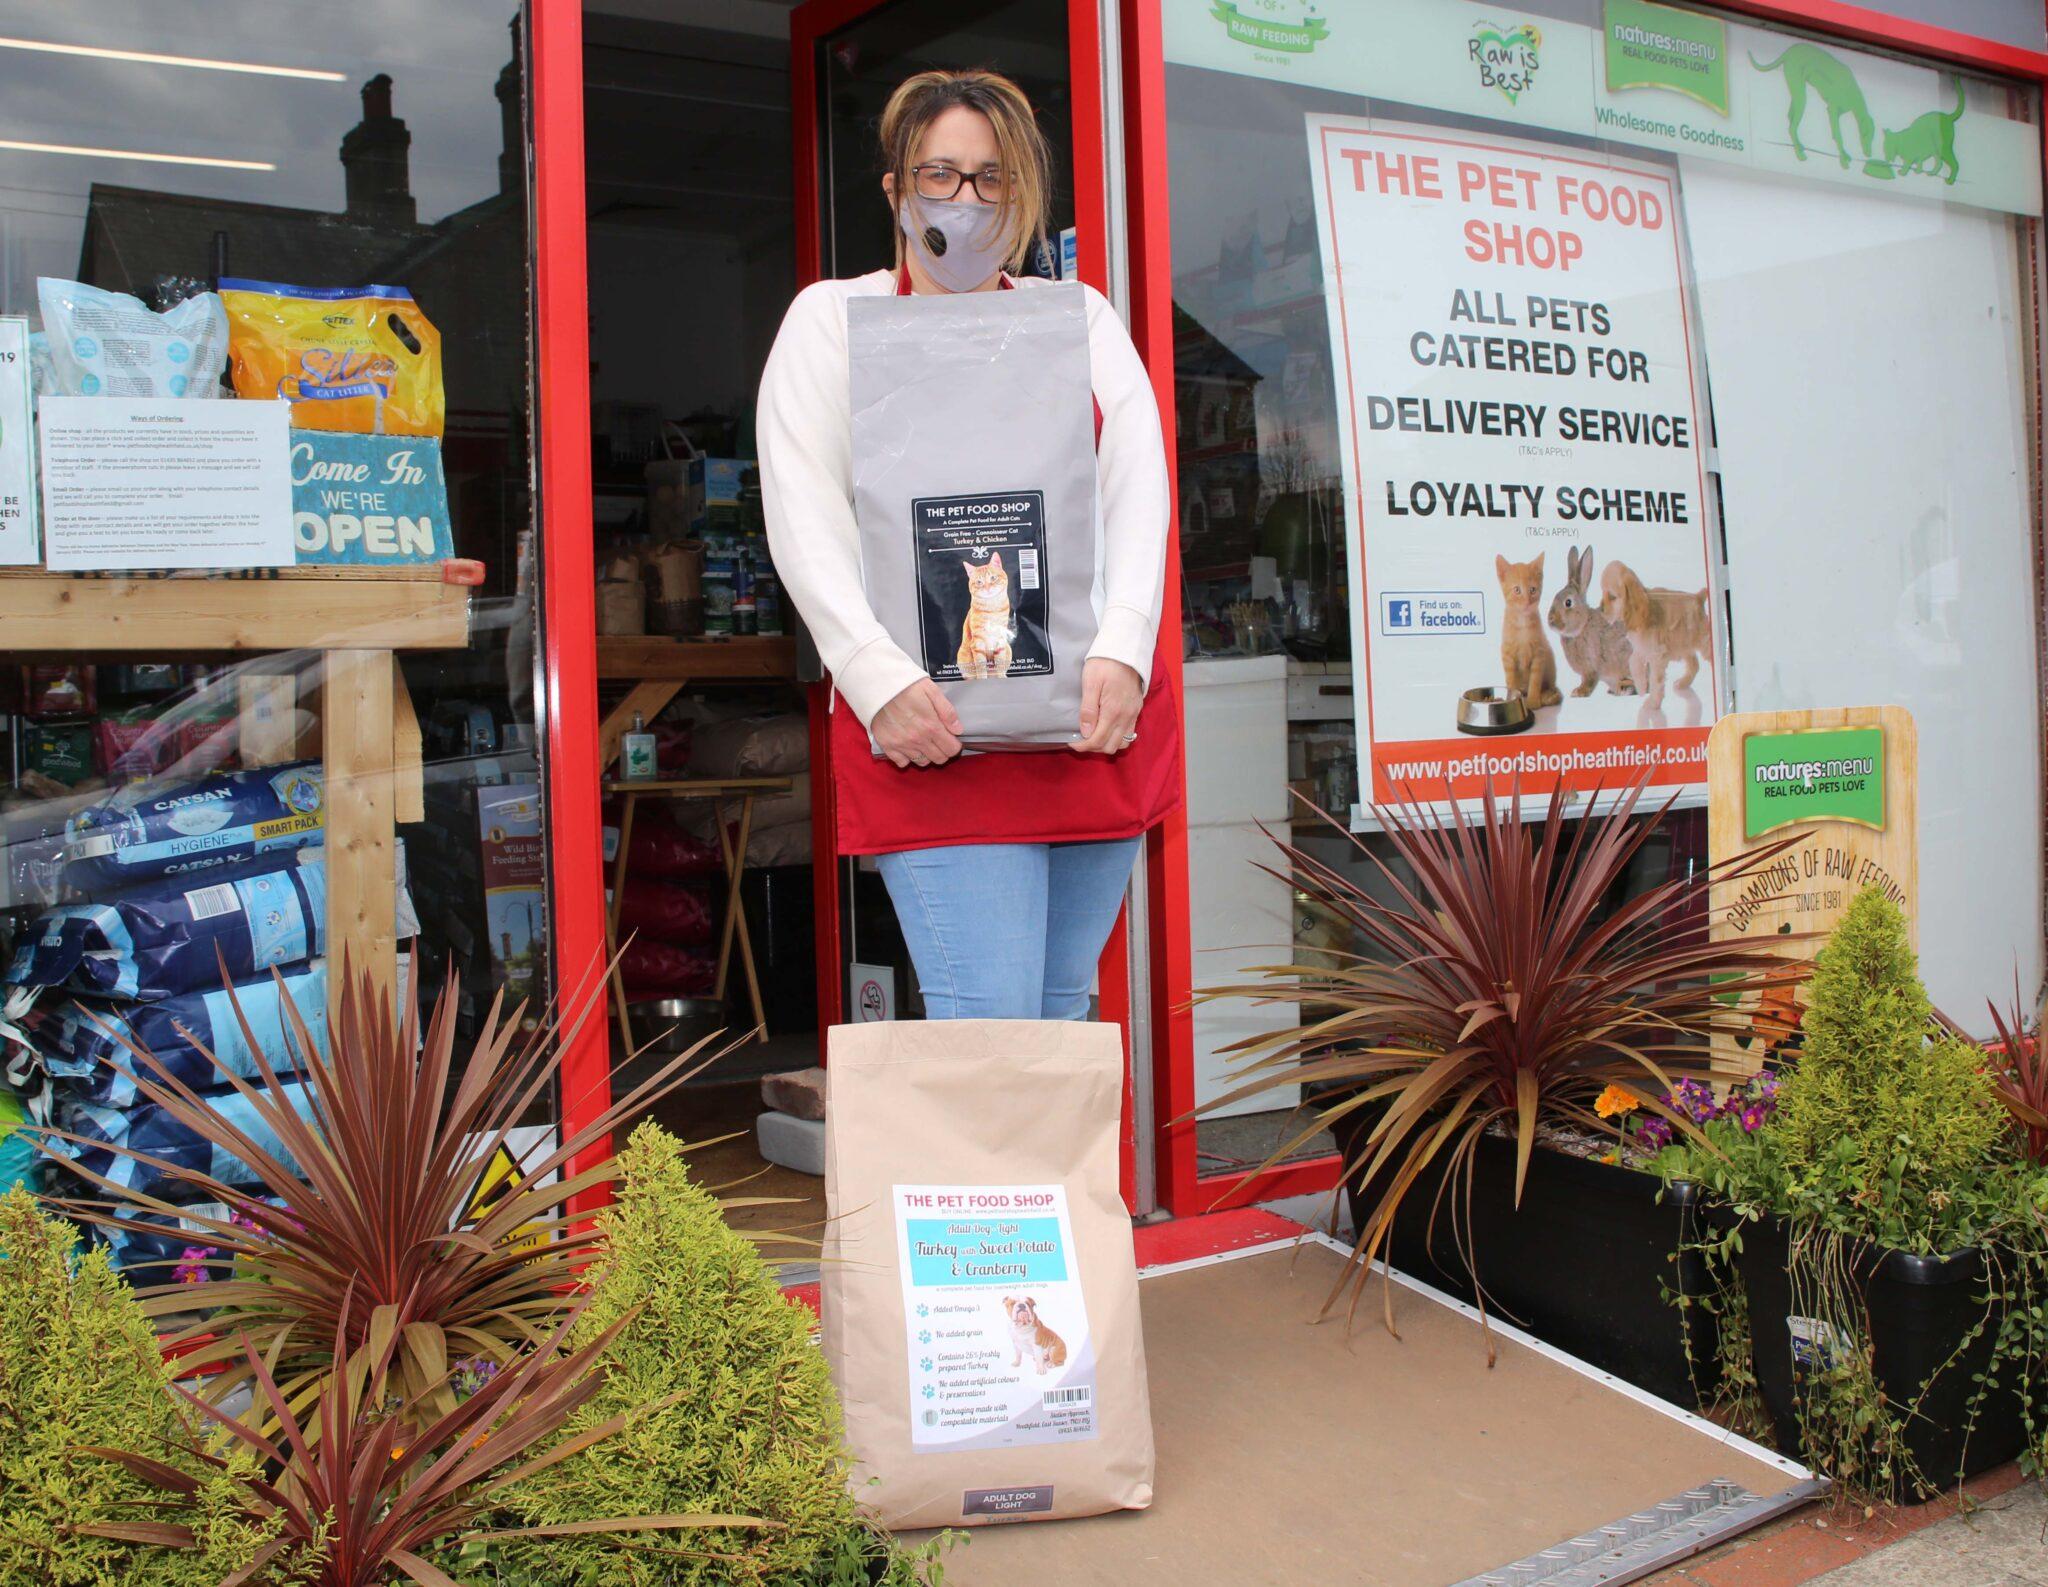 Shop assistant with pet food